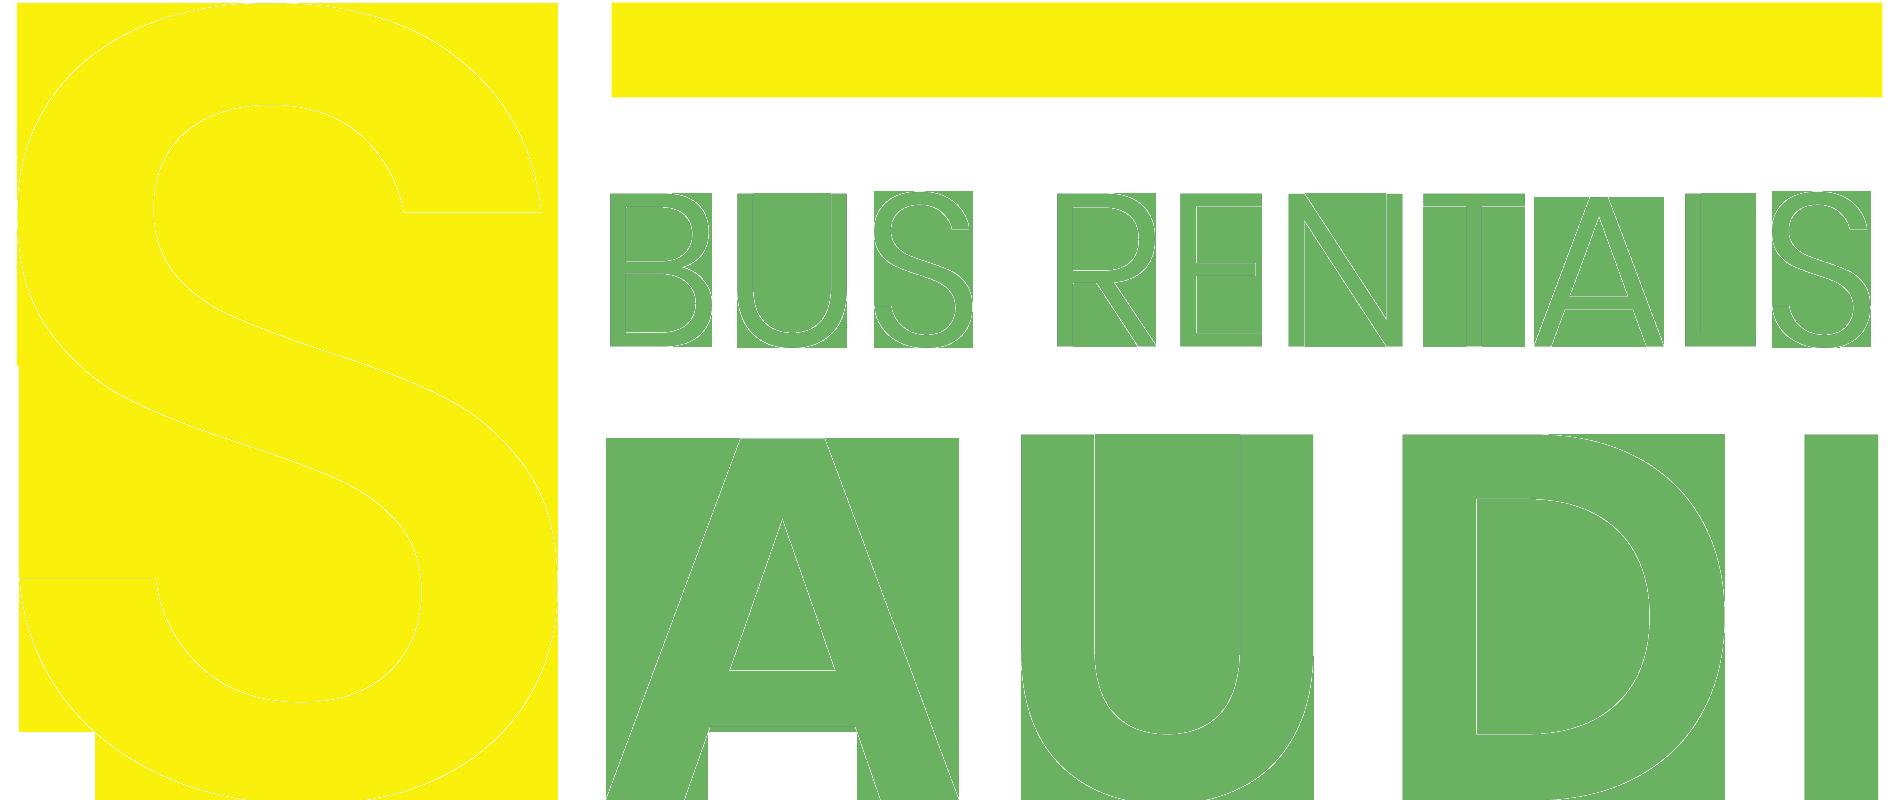 Saudi Arabia Taxis Minibus Hire